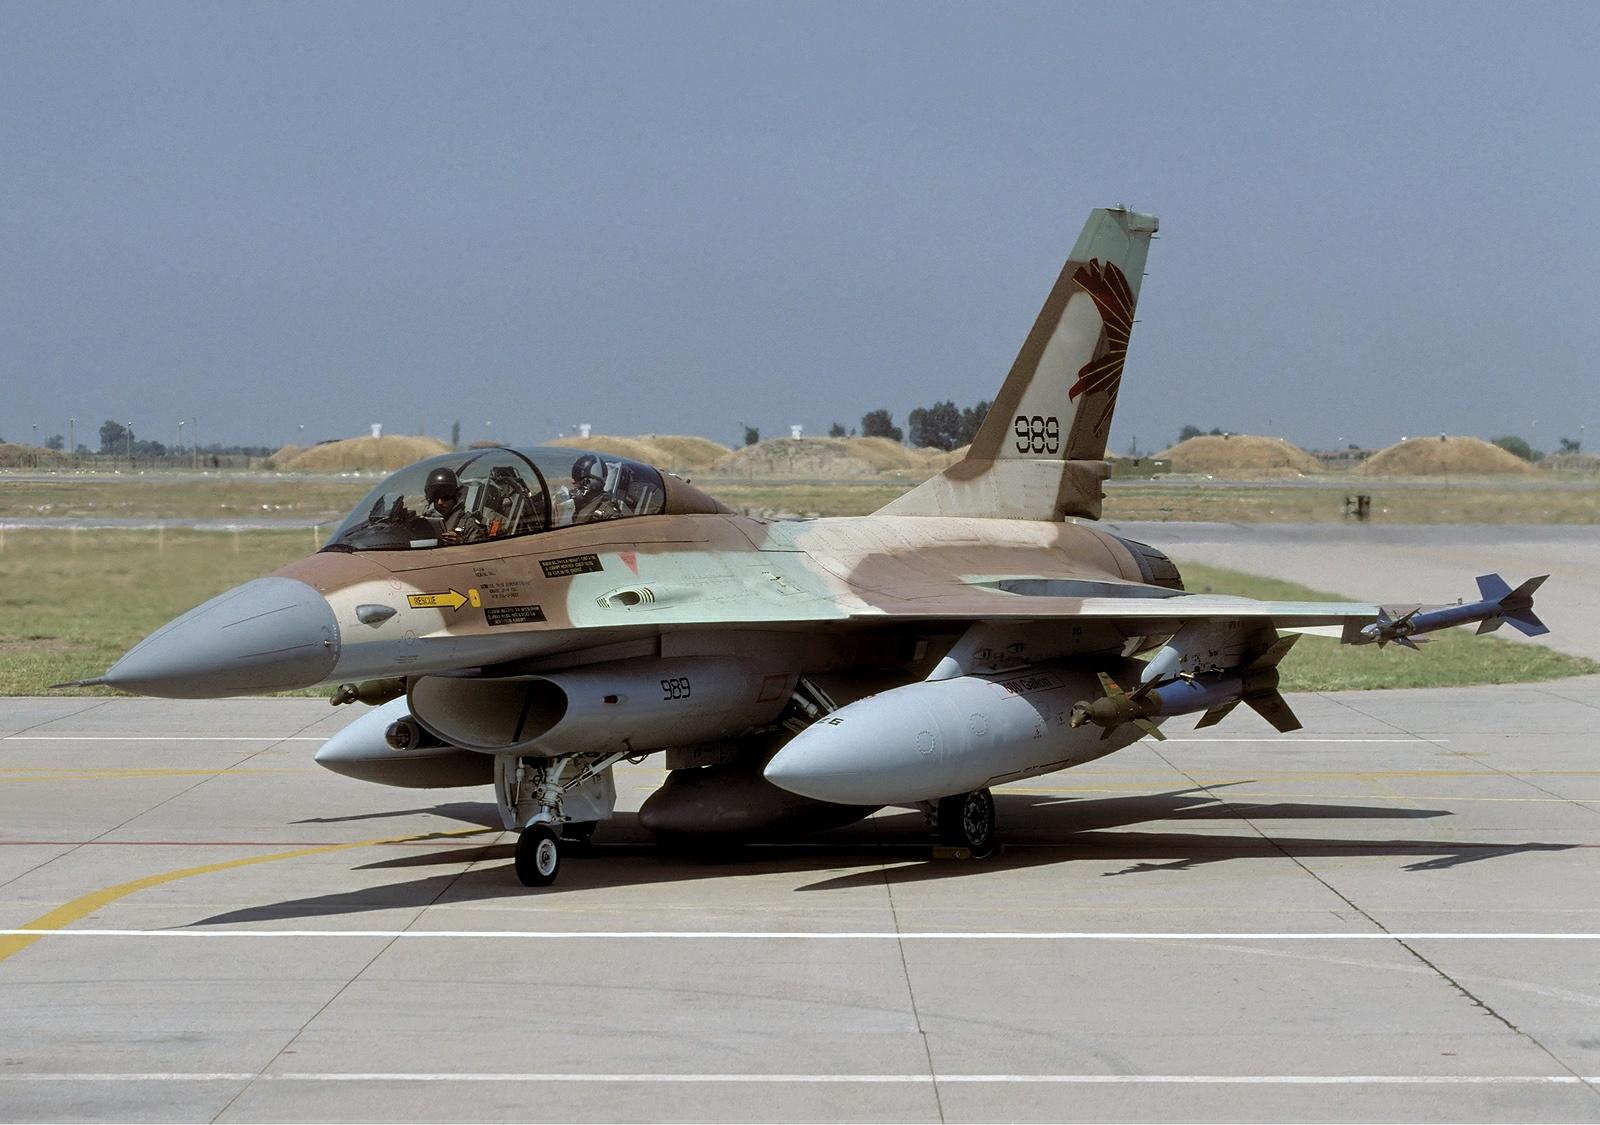 File:Israeli Air Force General Dynamics F 16B Netz (401) Lofting